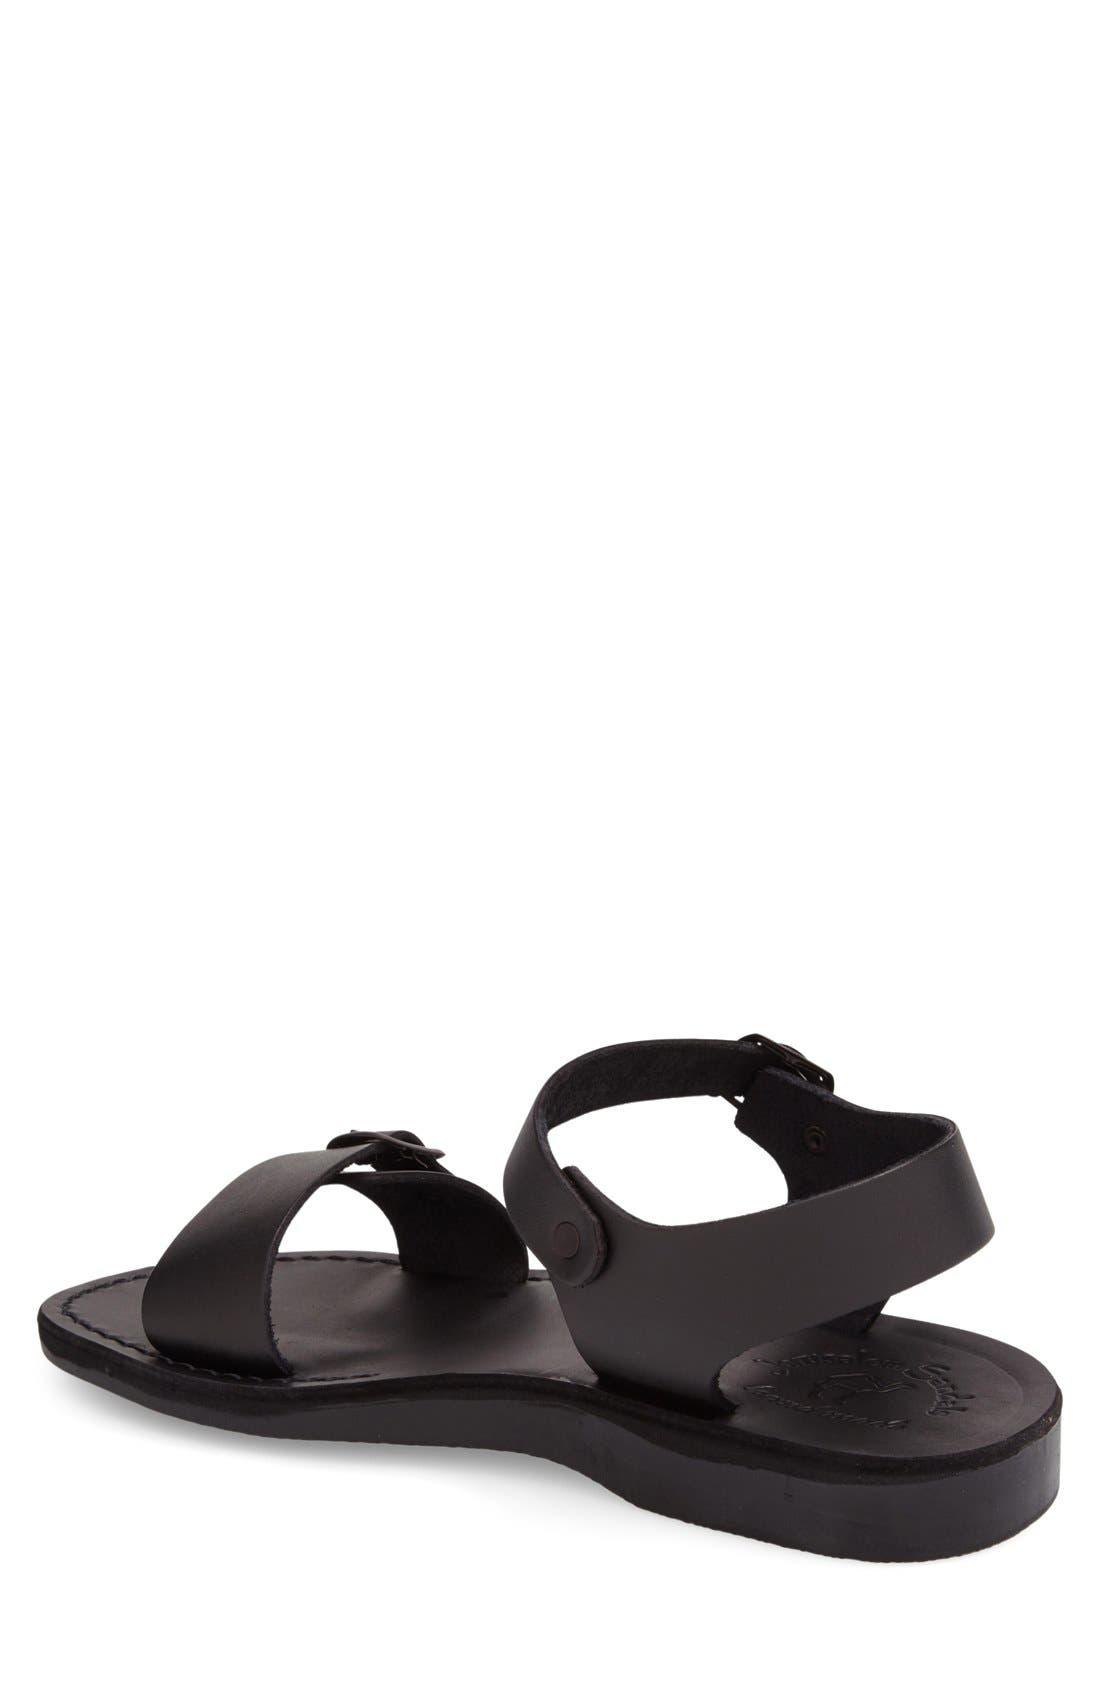 'The Original' Sandal,                             Alternate thumbnail 2, color,                             Black Leather